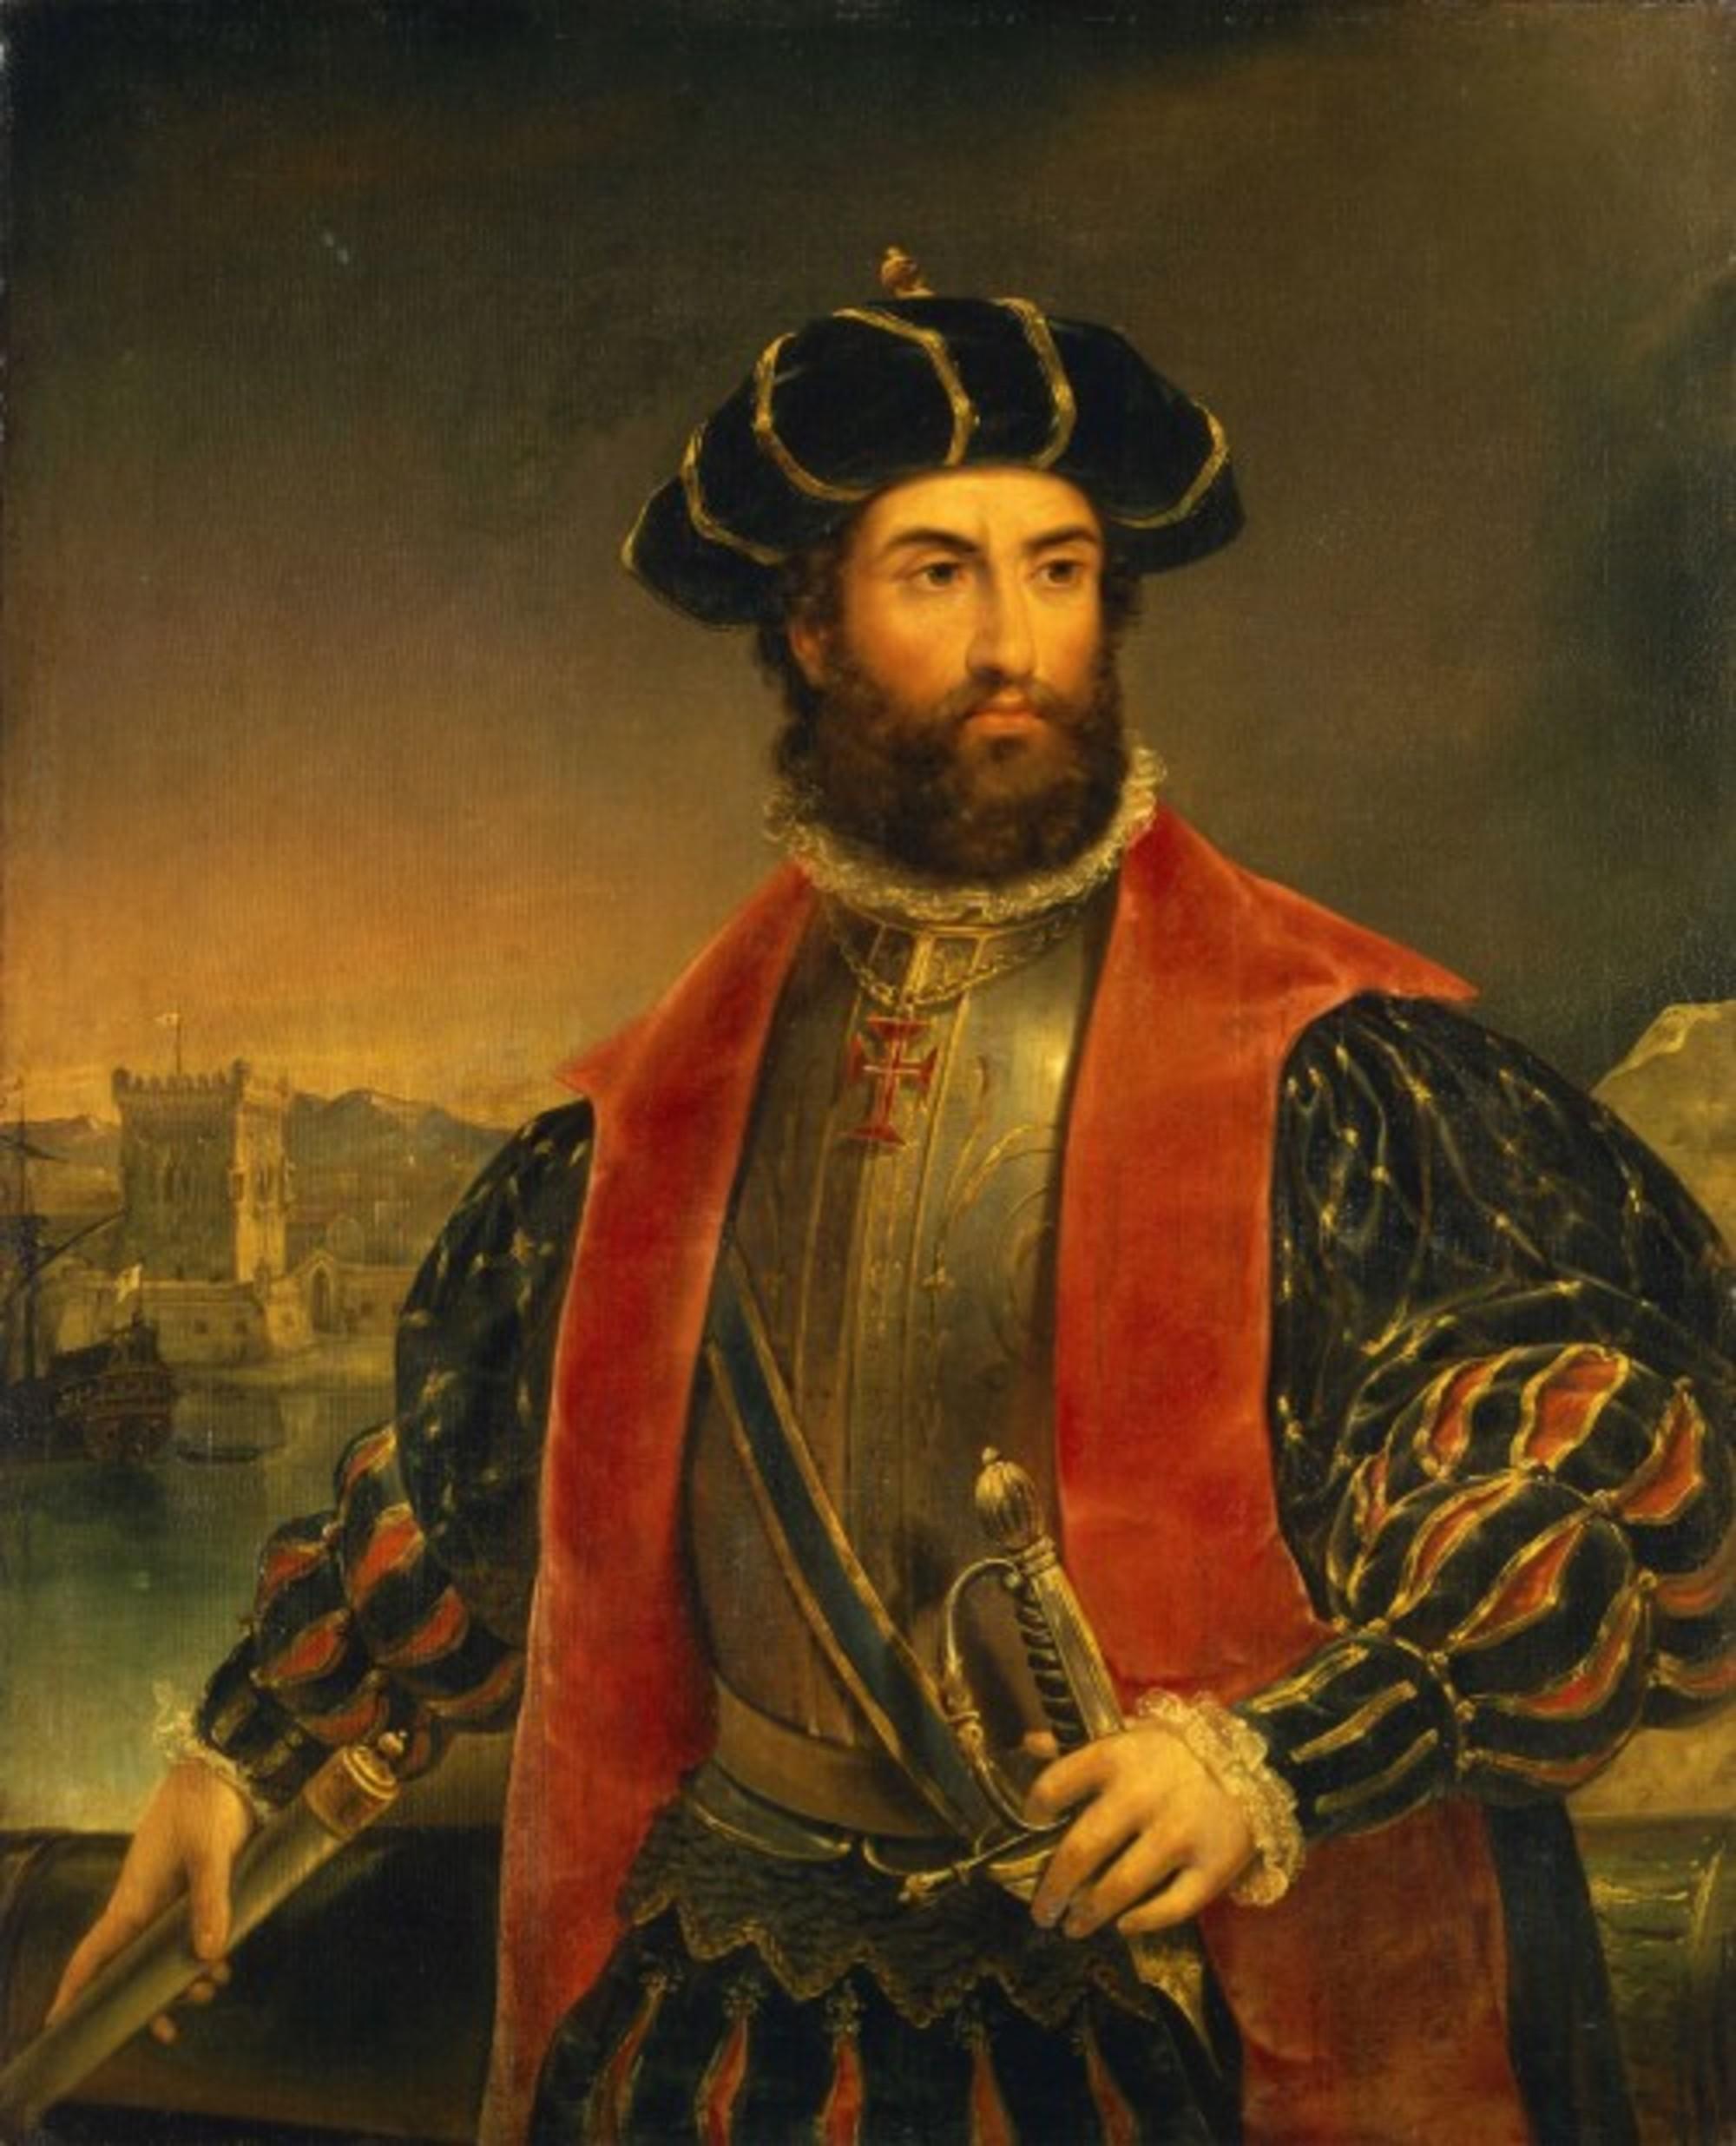 Vasco-da-Gama-circa-1460-1524-RMG-BHC2702.jpg